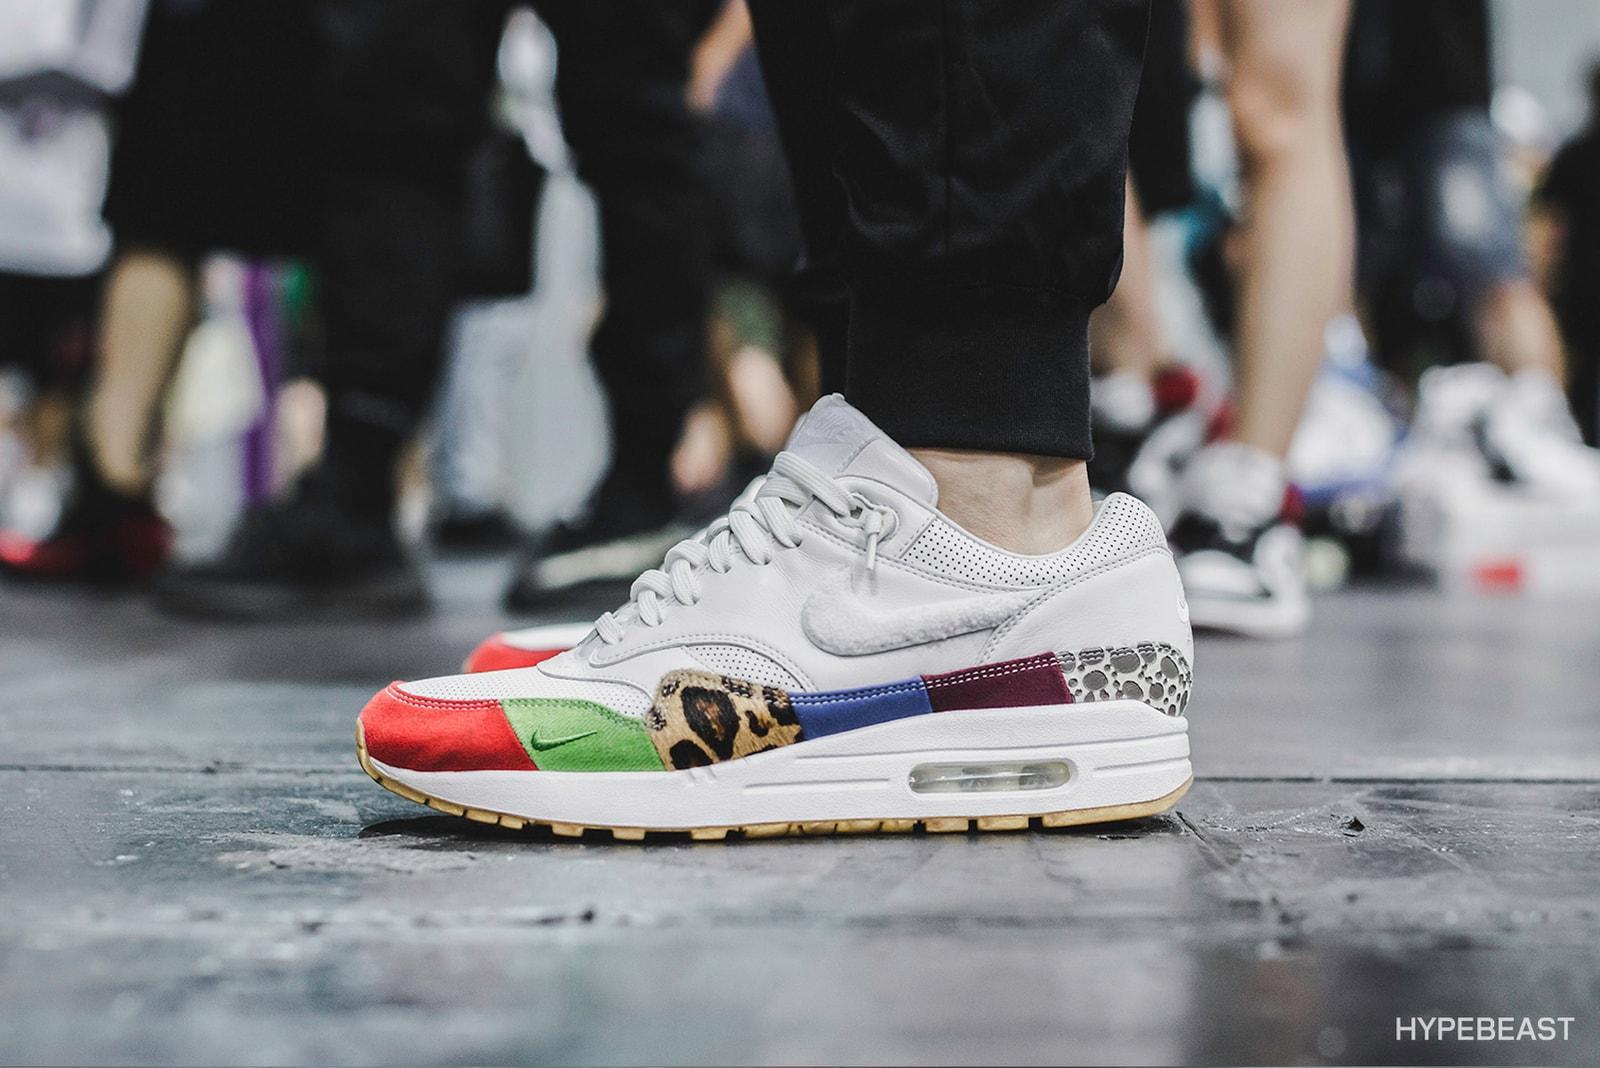 adidas Originals YEEZY Zebra